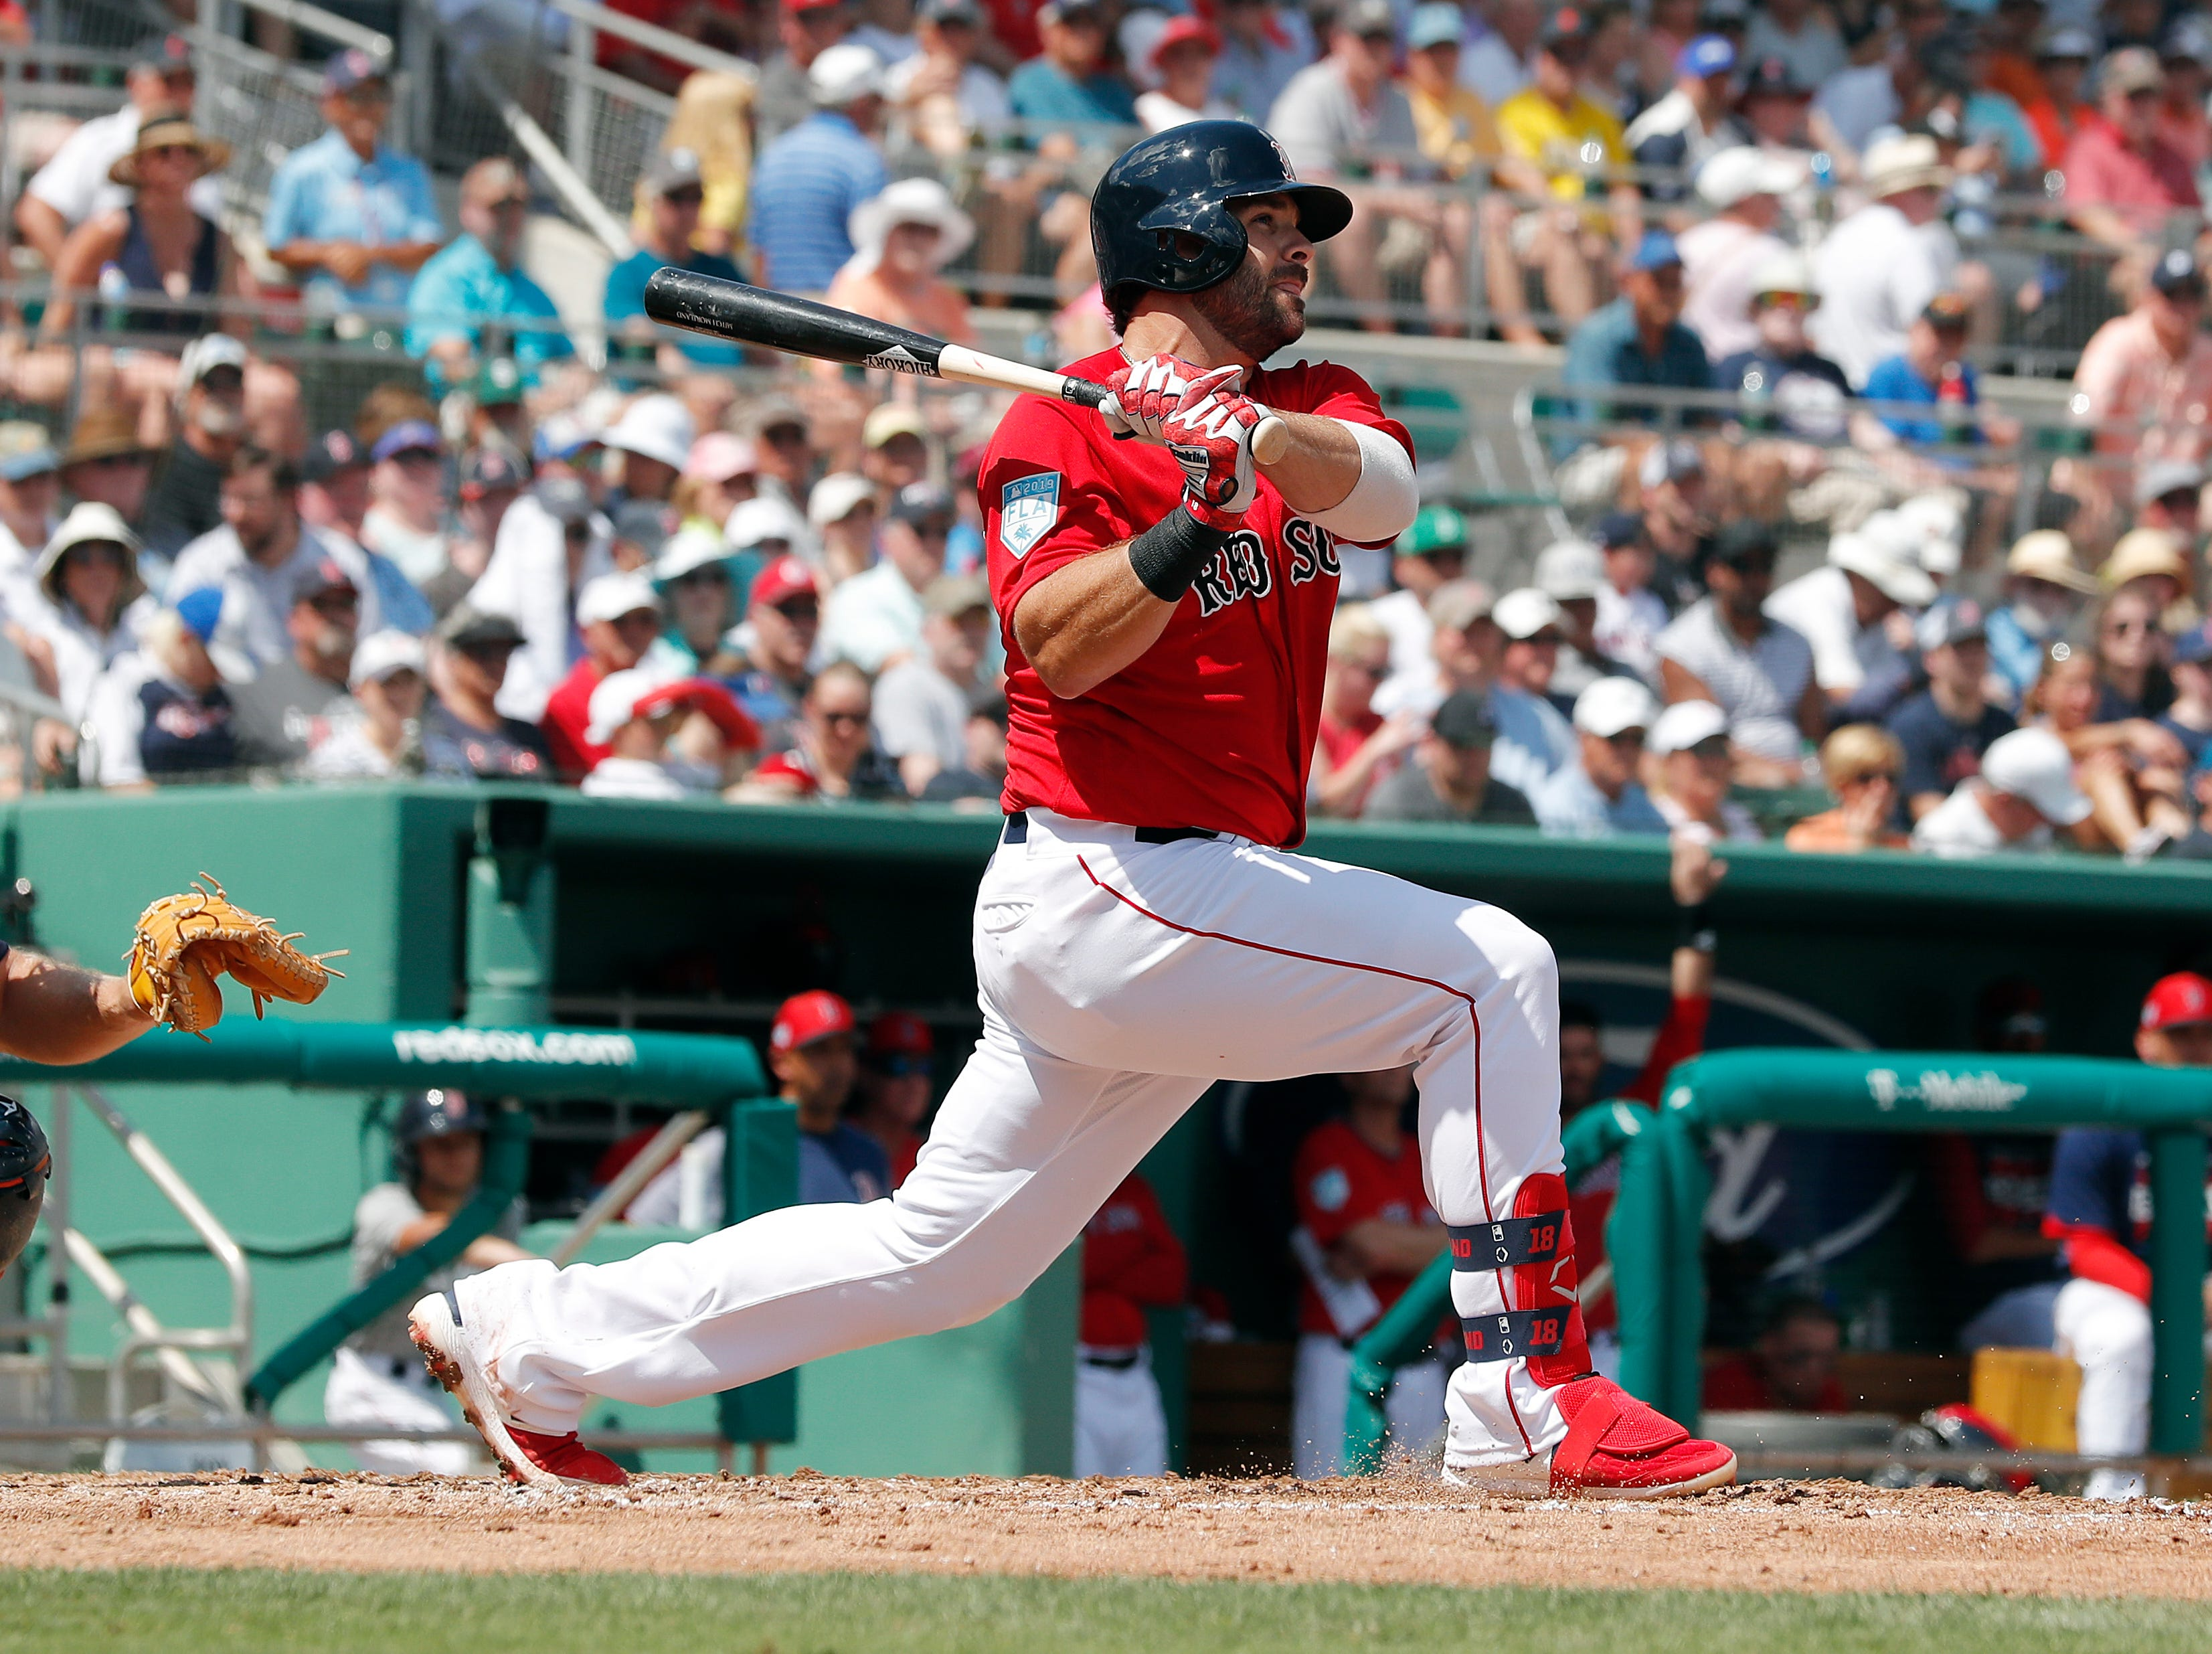 Boston Red Sox right fielder J.D. Martinez bats against the Tigers.